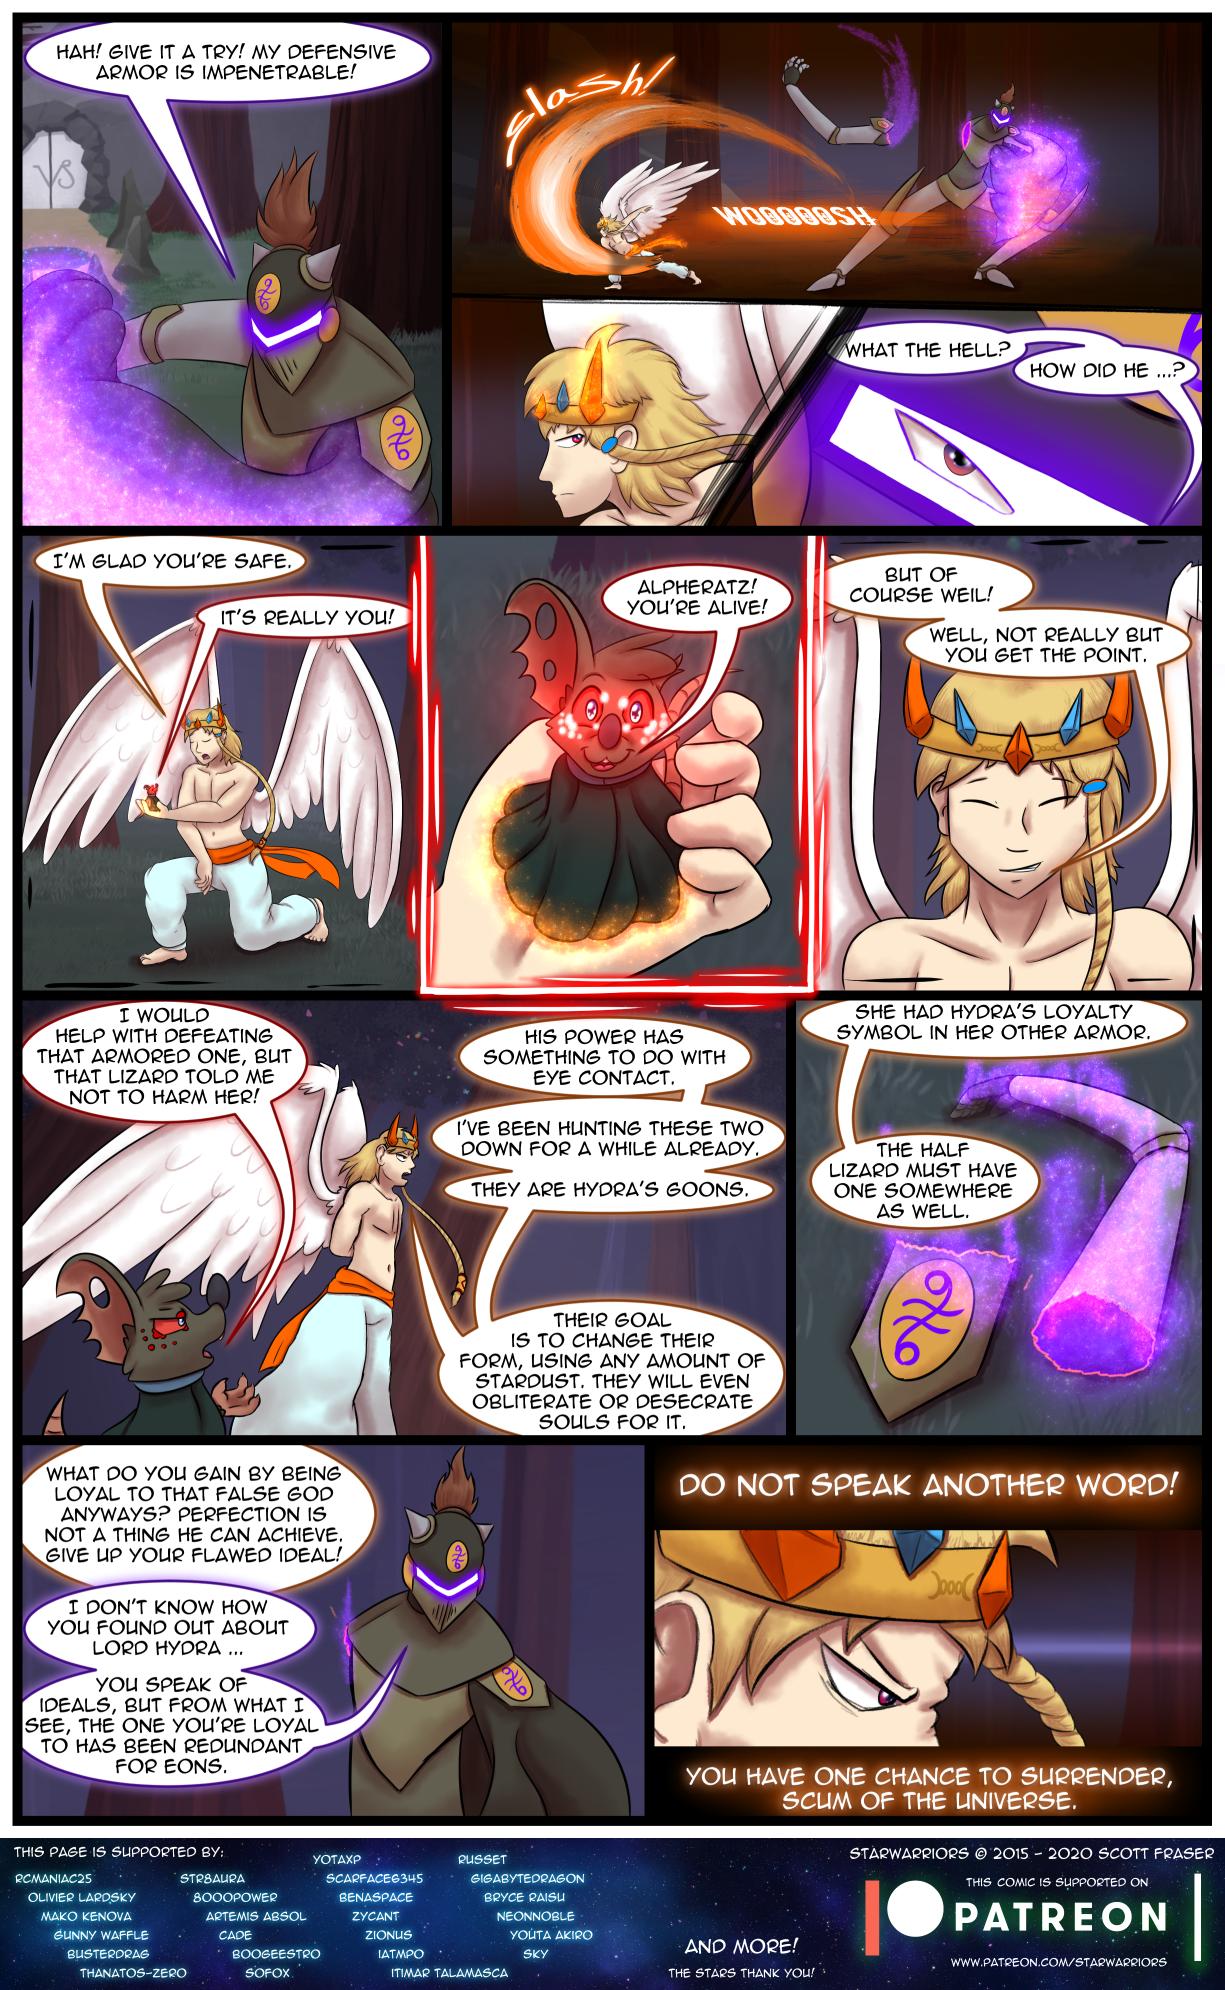 Ch5 Page 21 – Alpheratz